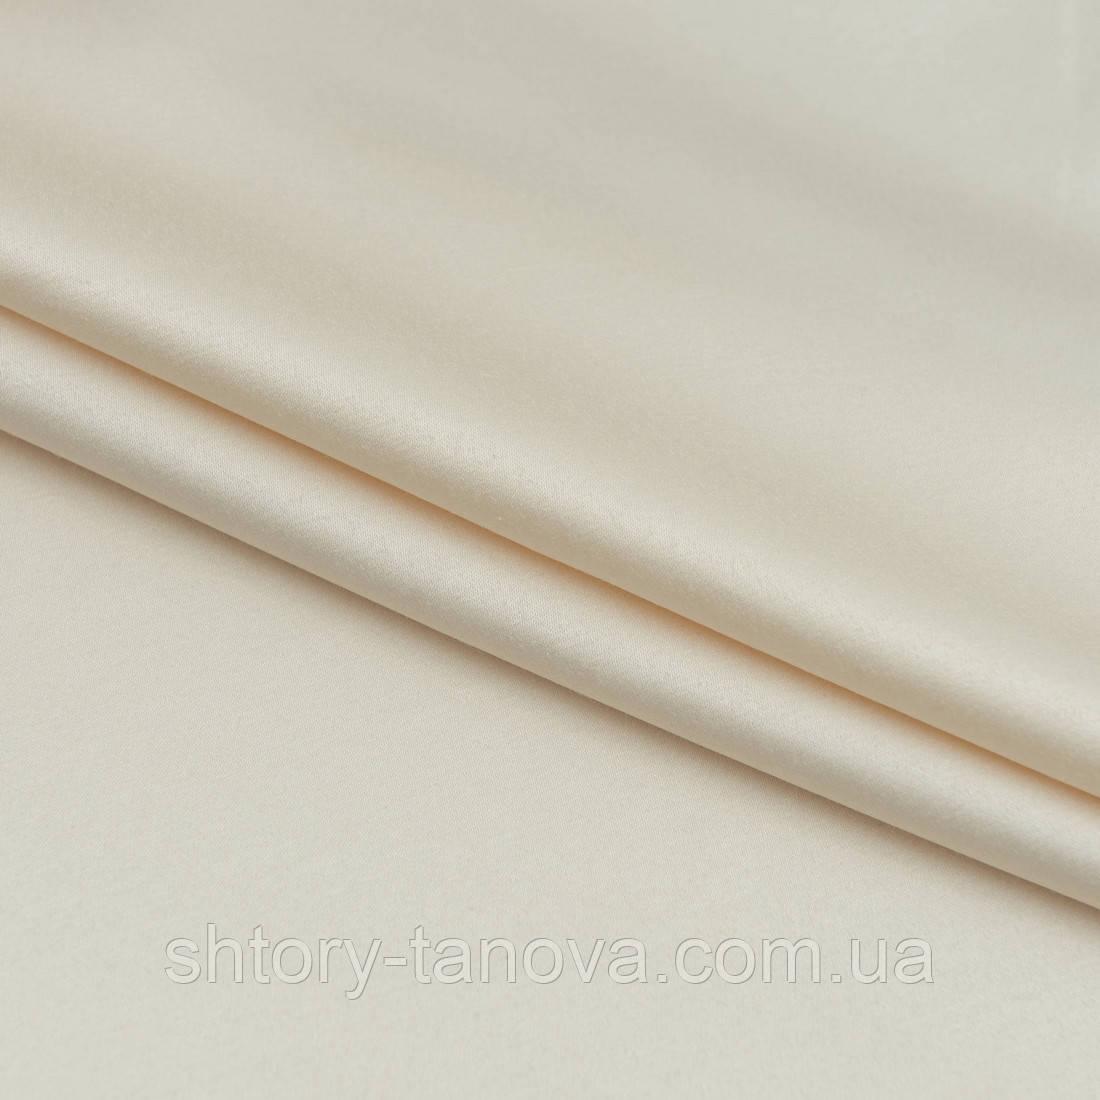 Декоративный сатин прада крем